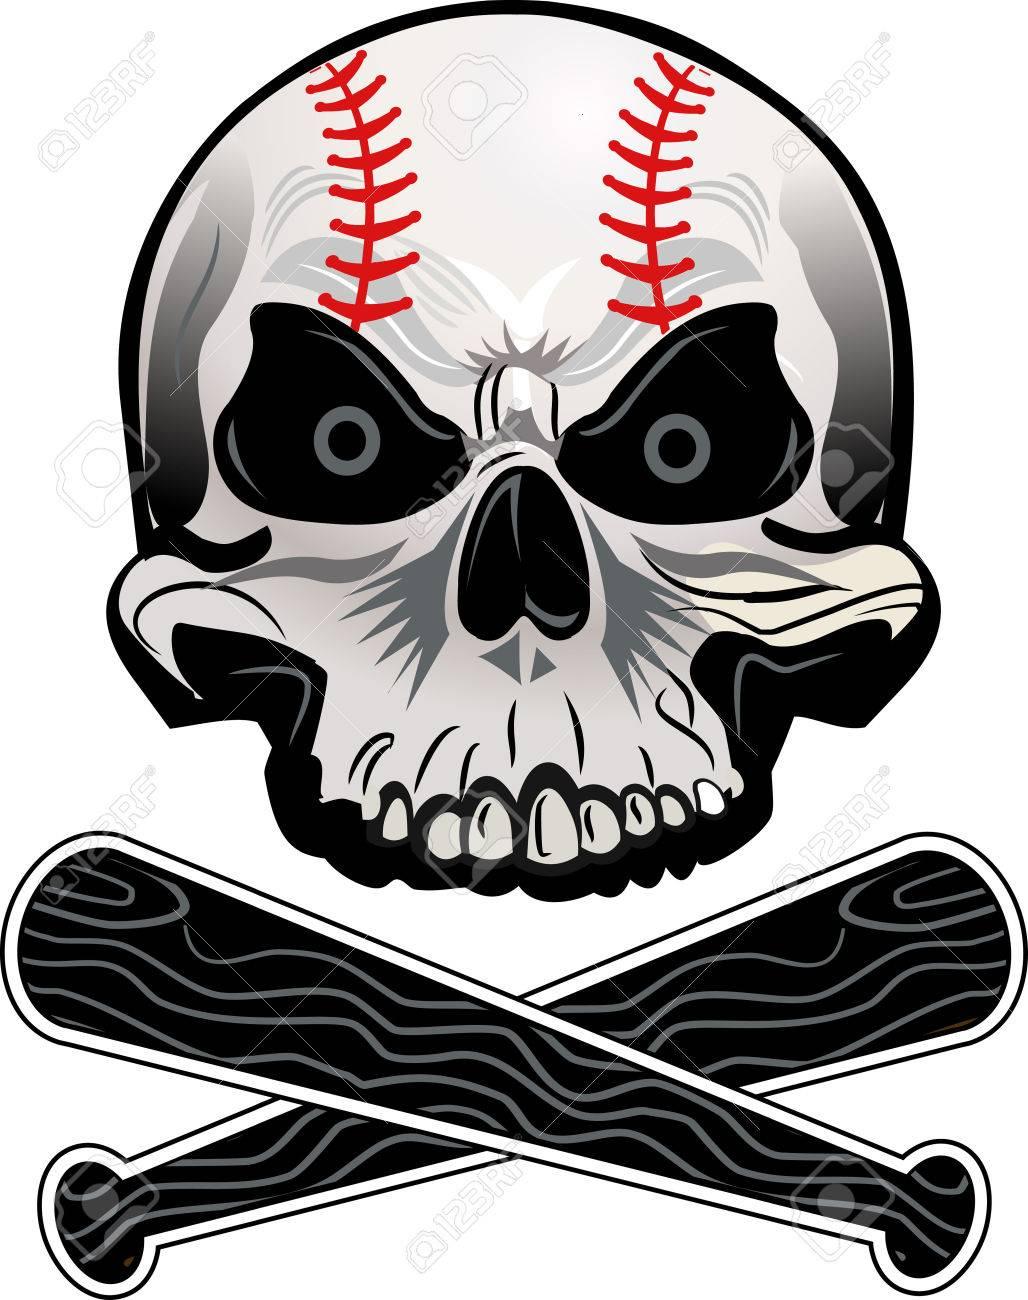 Baseball skull ball and bat.